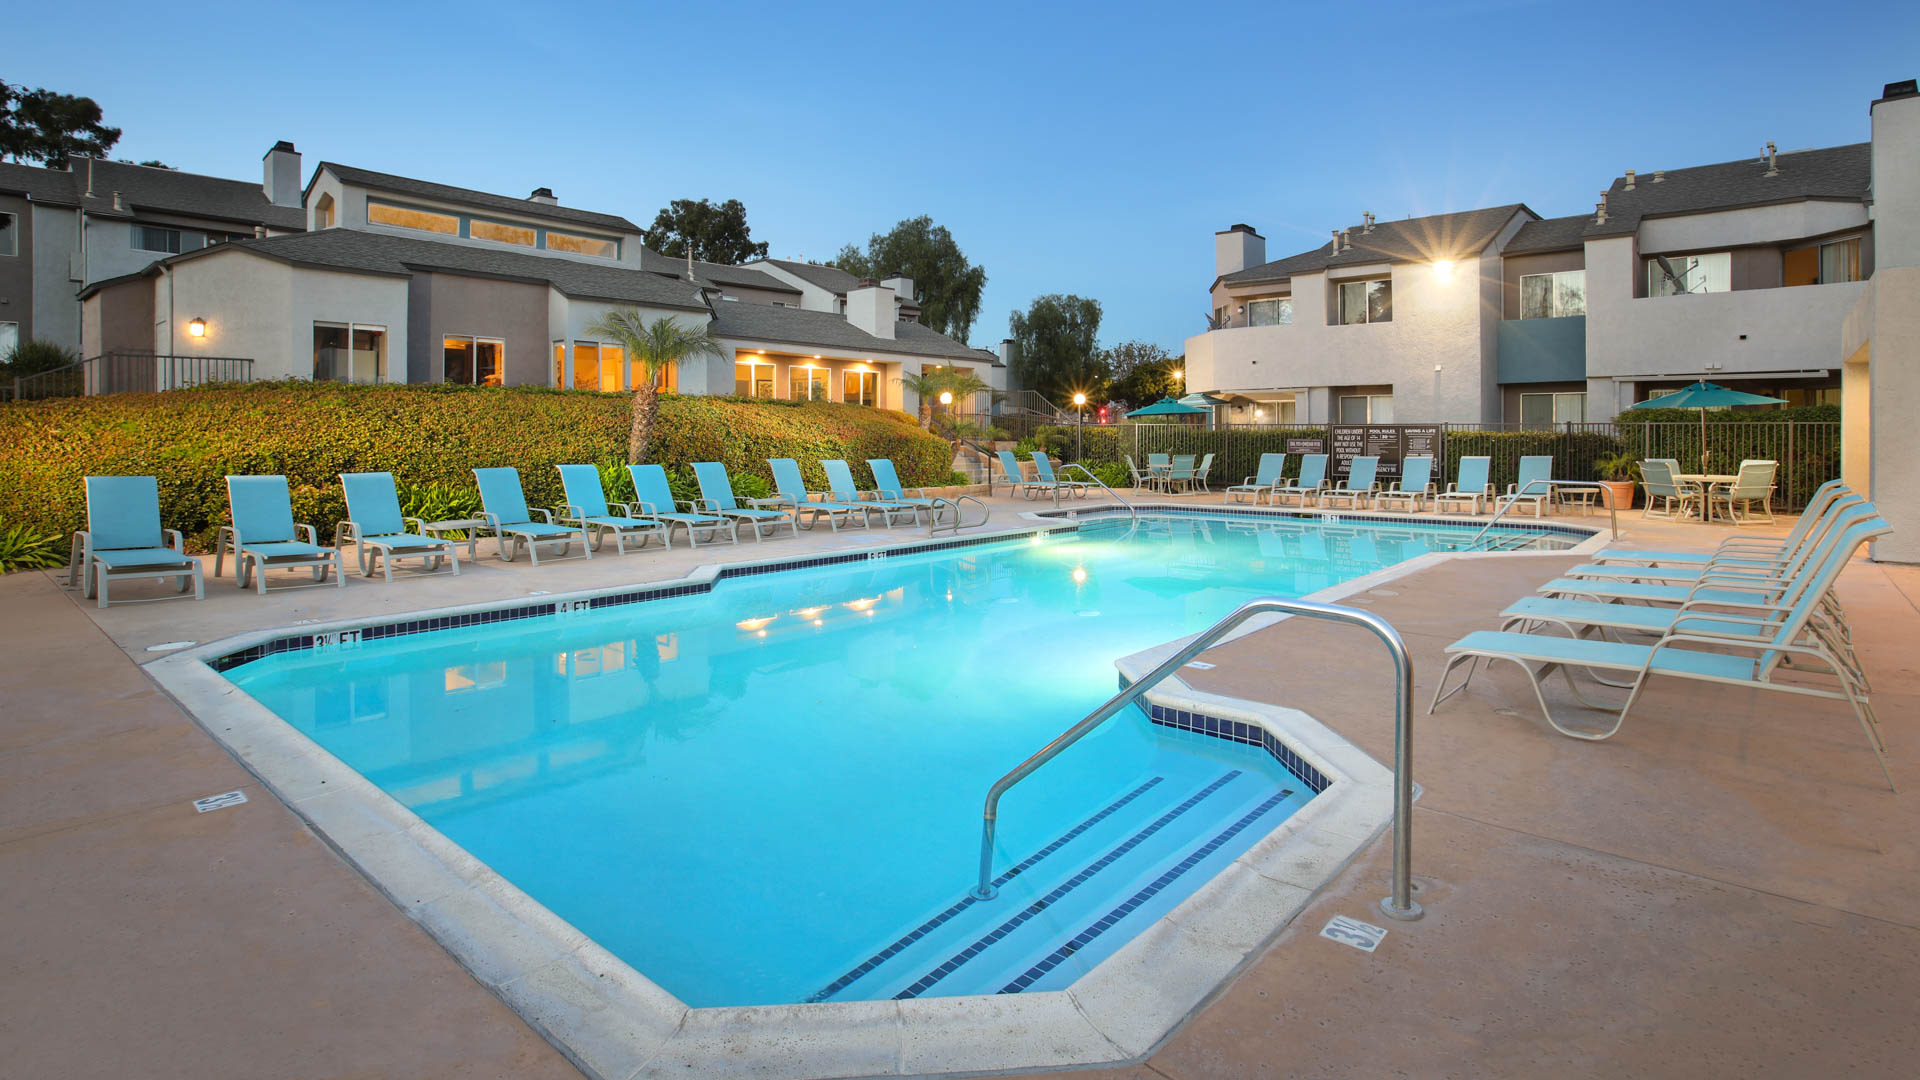 Villa Solana Apartments - Swimming Pool